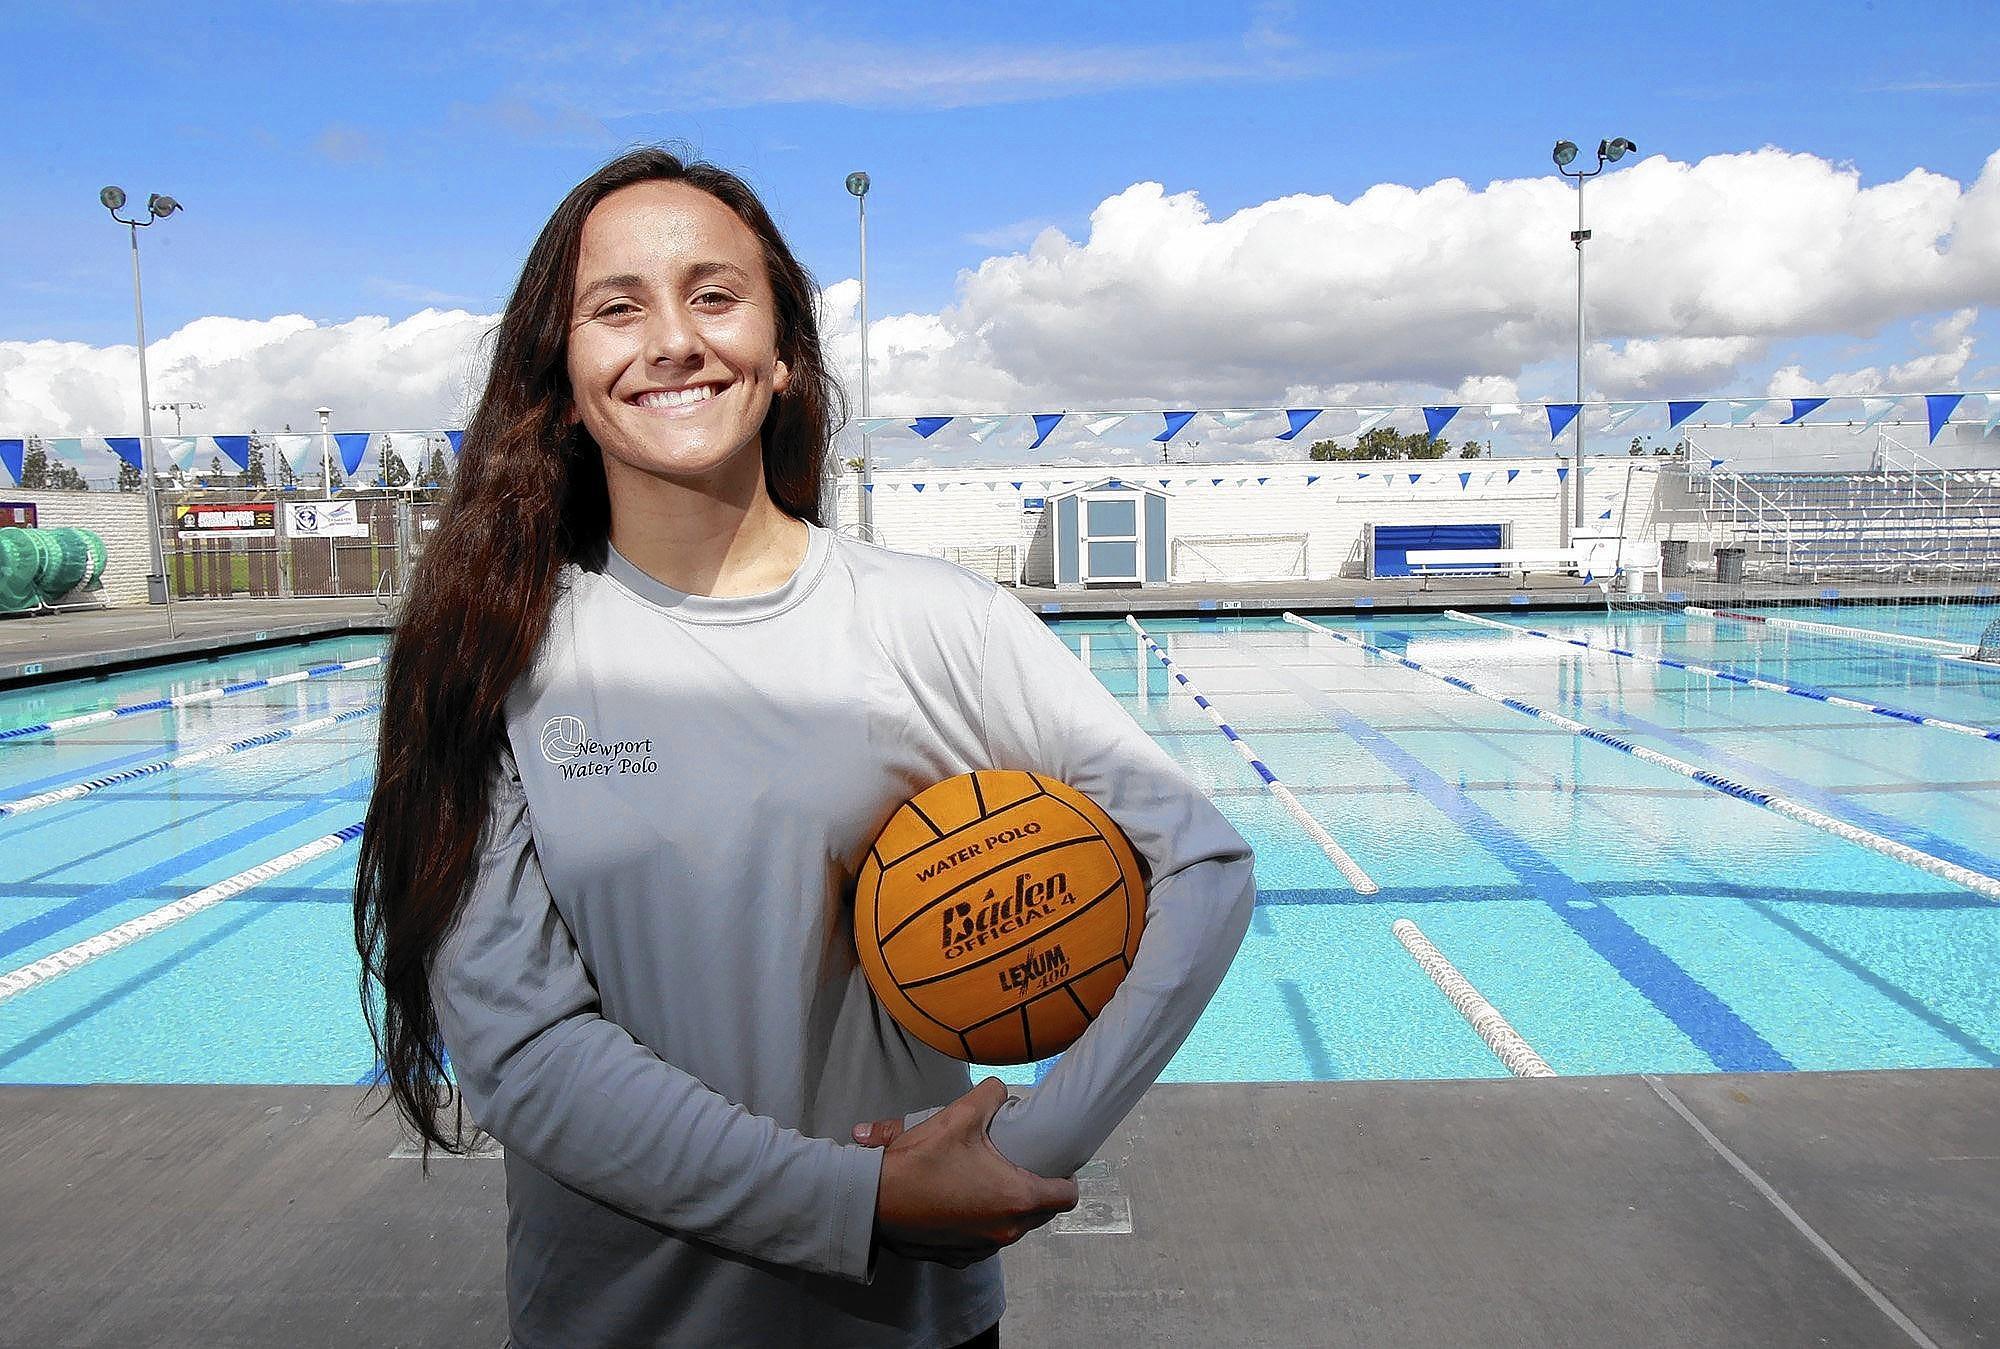 Newport Harbor High's Rachel Whitelegge is the Daily Pilot High School Athlete of the Week.